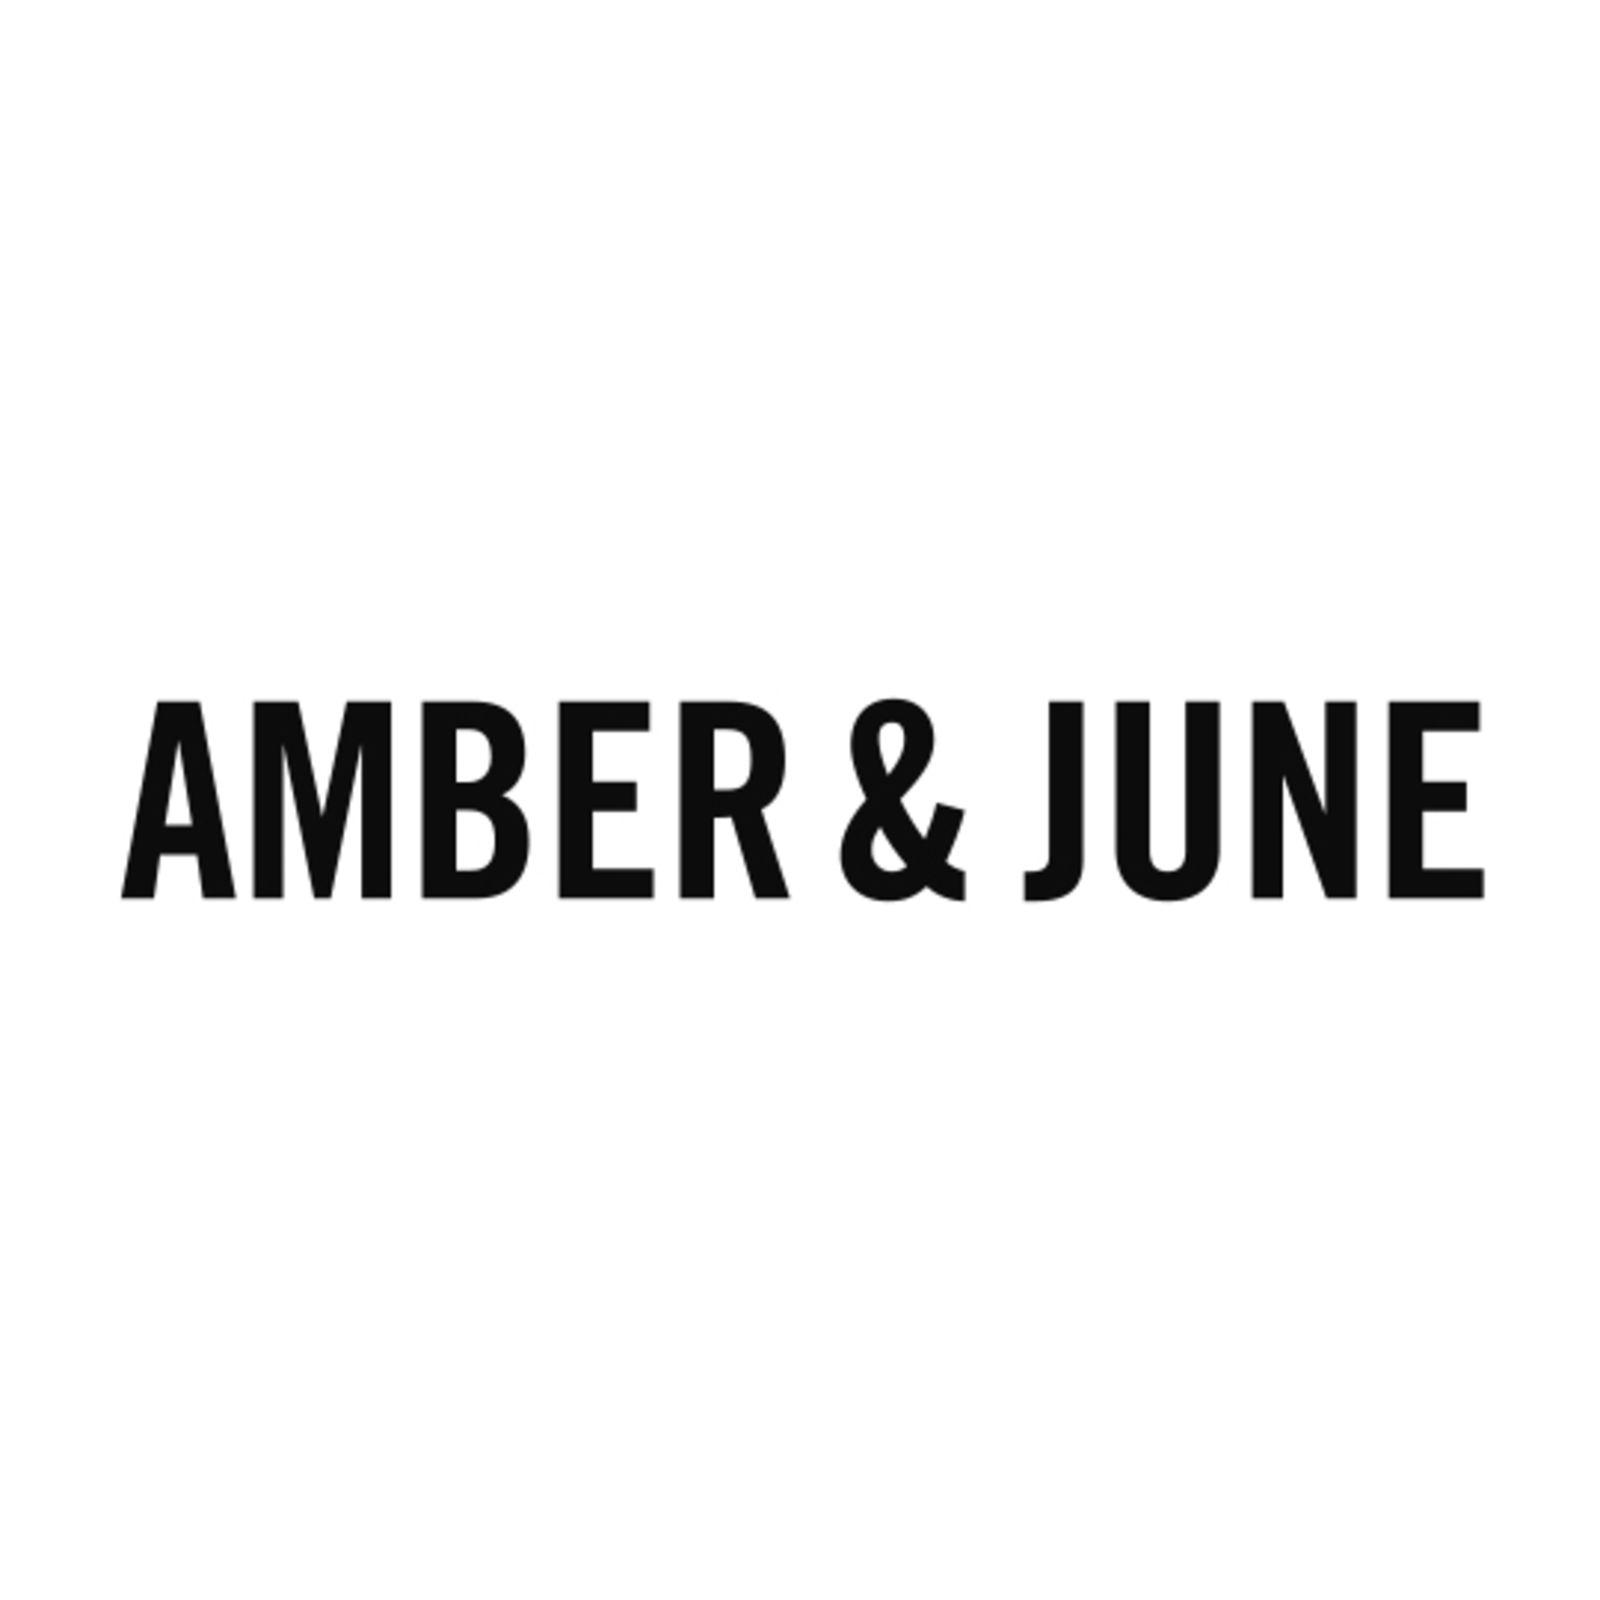 AMBER & JUNE (Bild 1)